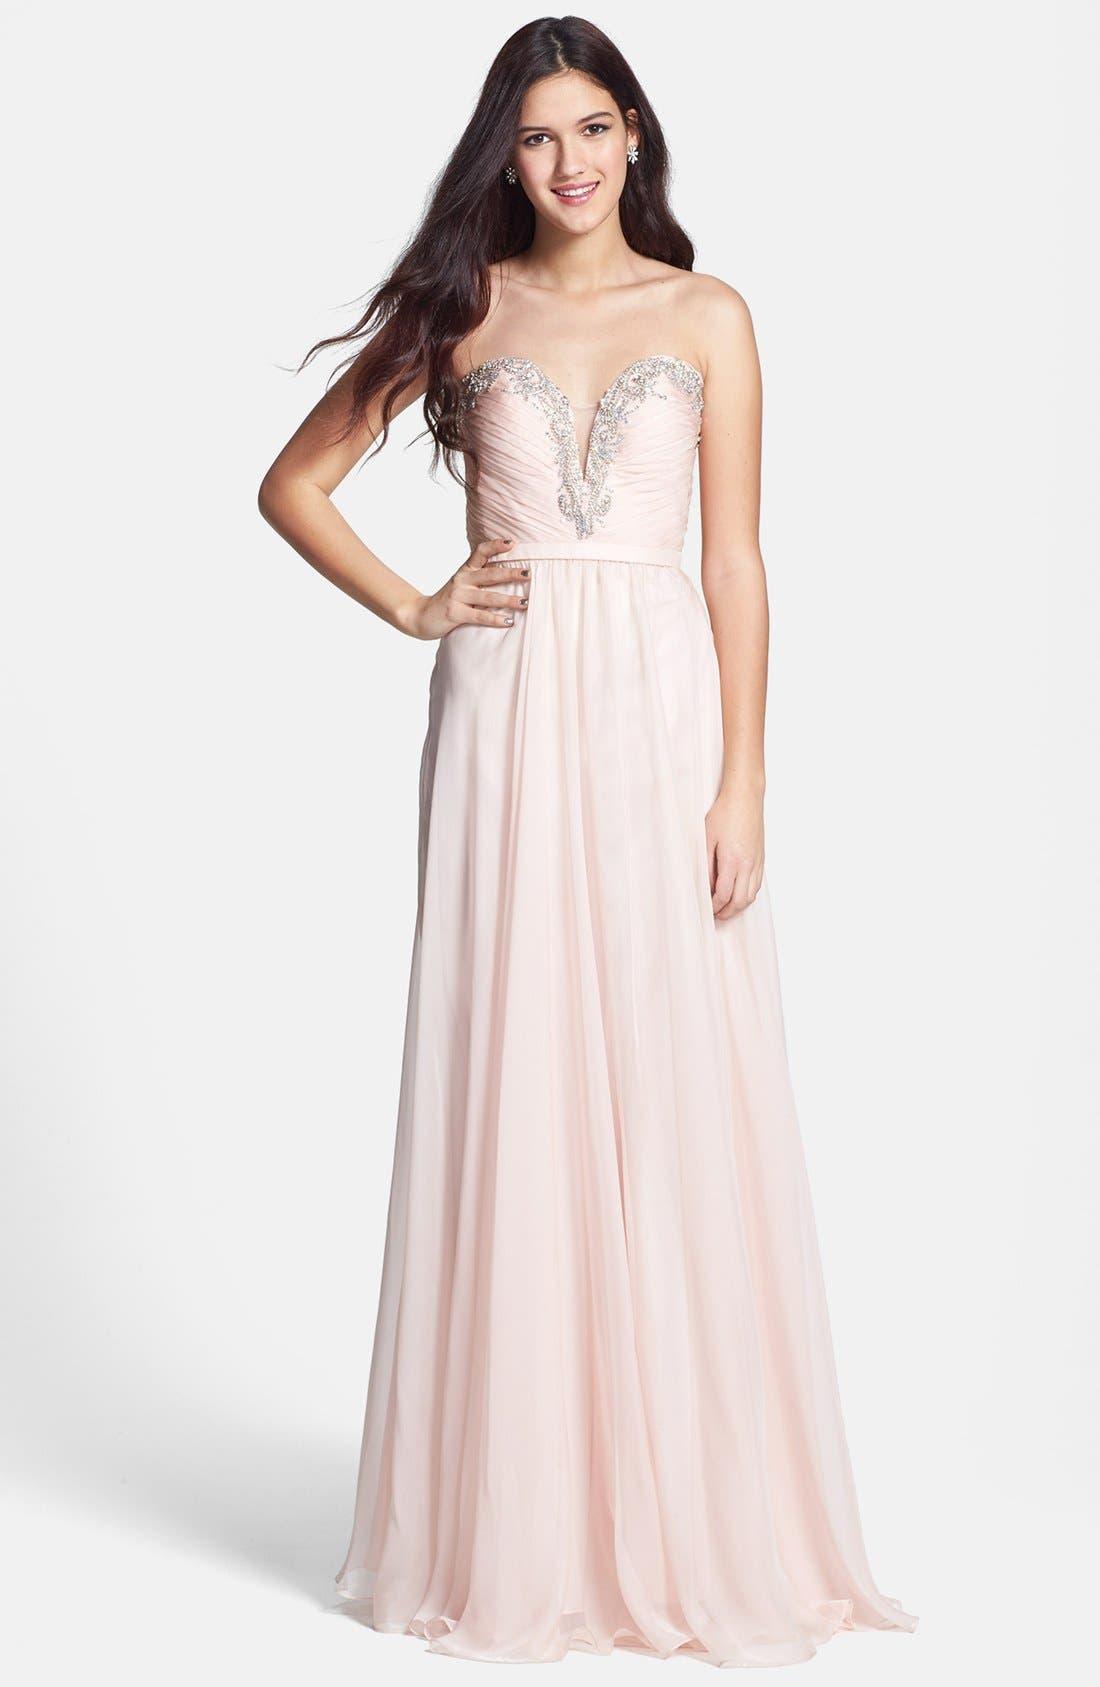 Main Image - La Femme Fashions Beaded Bodice Chiffon Gown